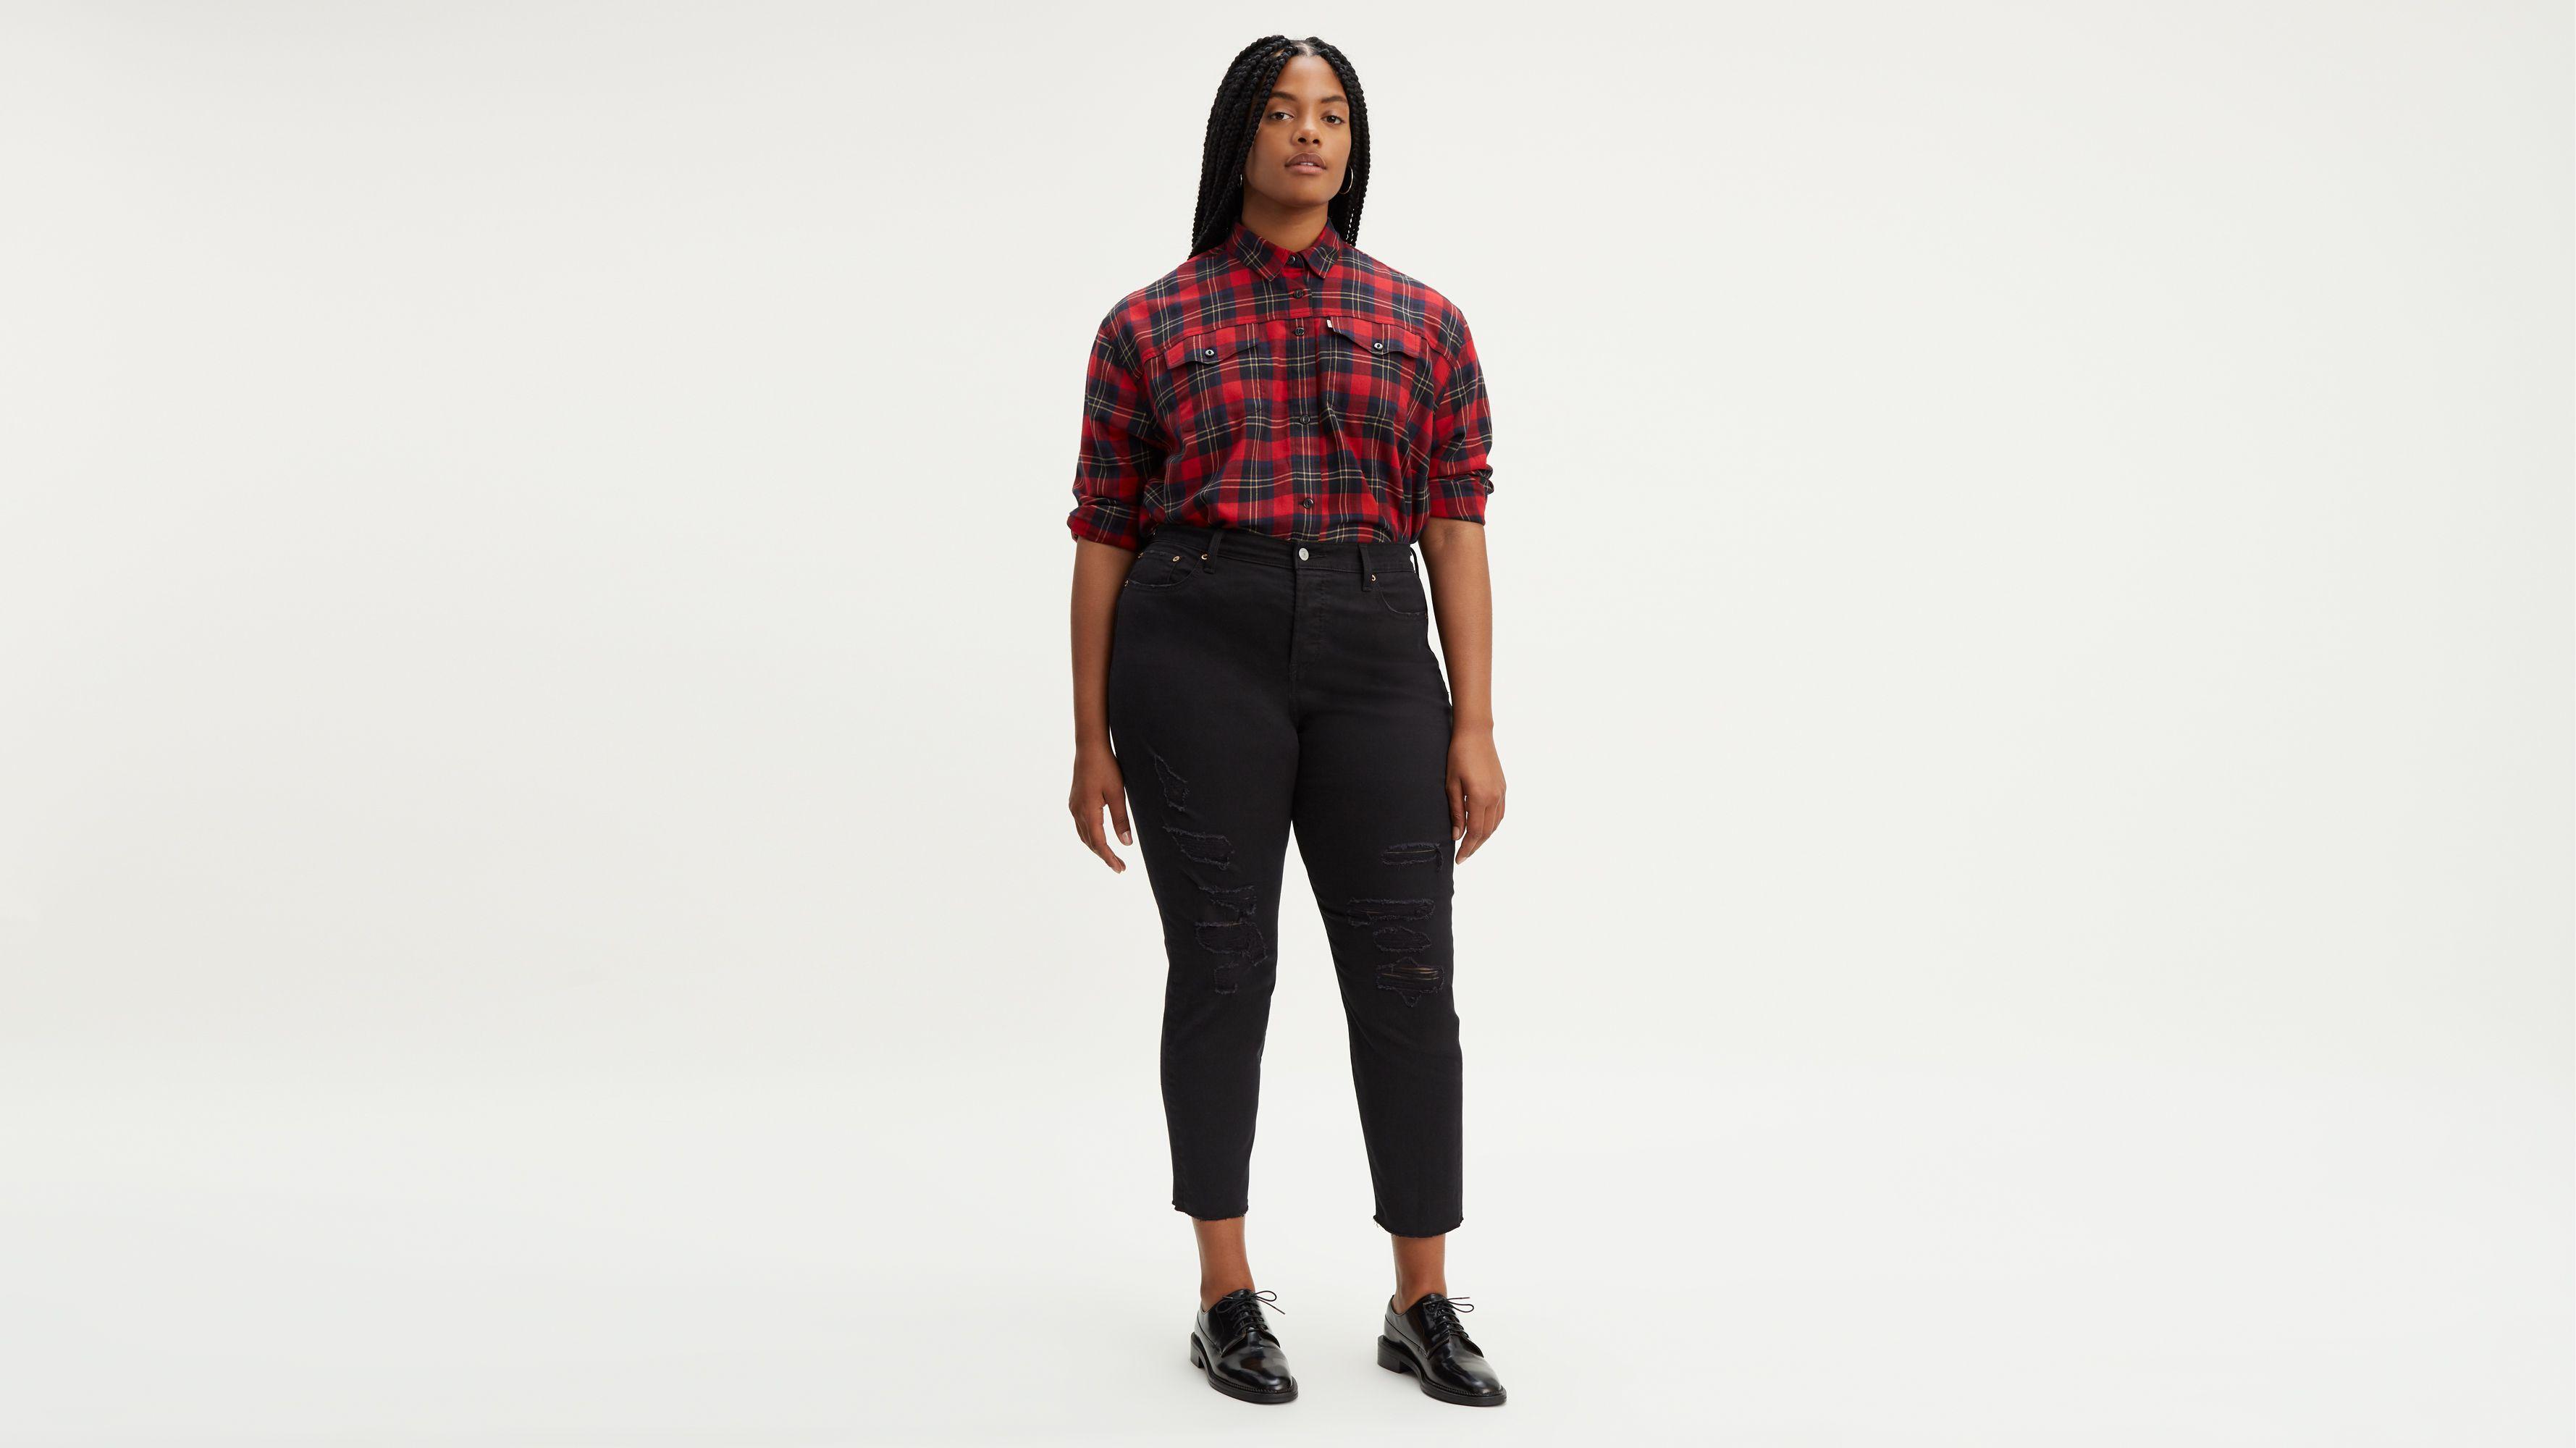 Wedgie Fit Skinny Women's Jeans (Plus Size)